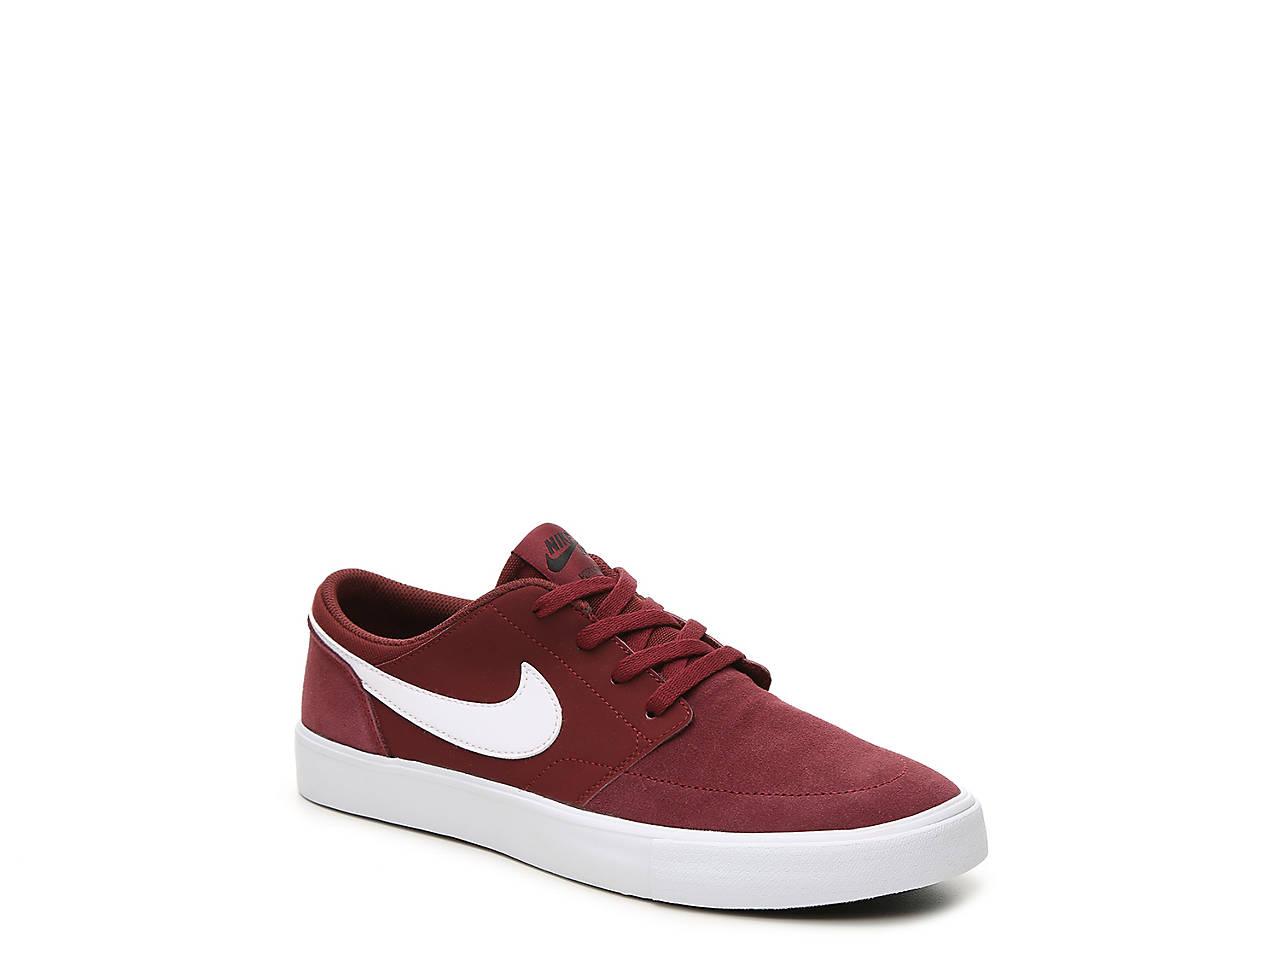 3d93e7d1b437 Nike SB Portmore II Youth Sneaker Kids Shoes